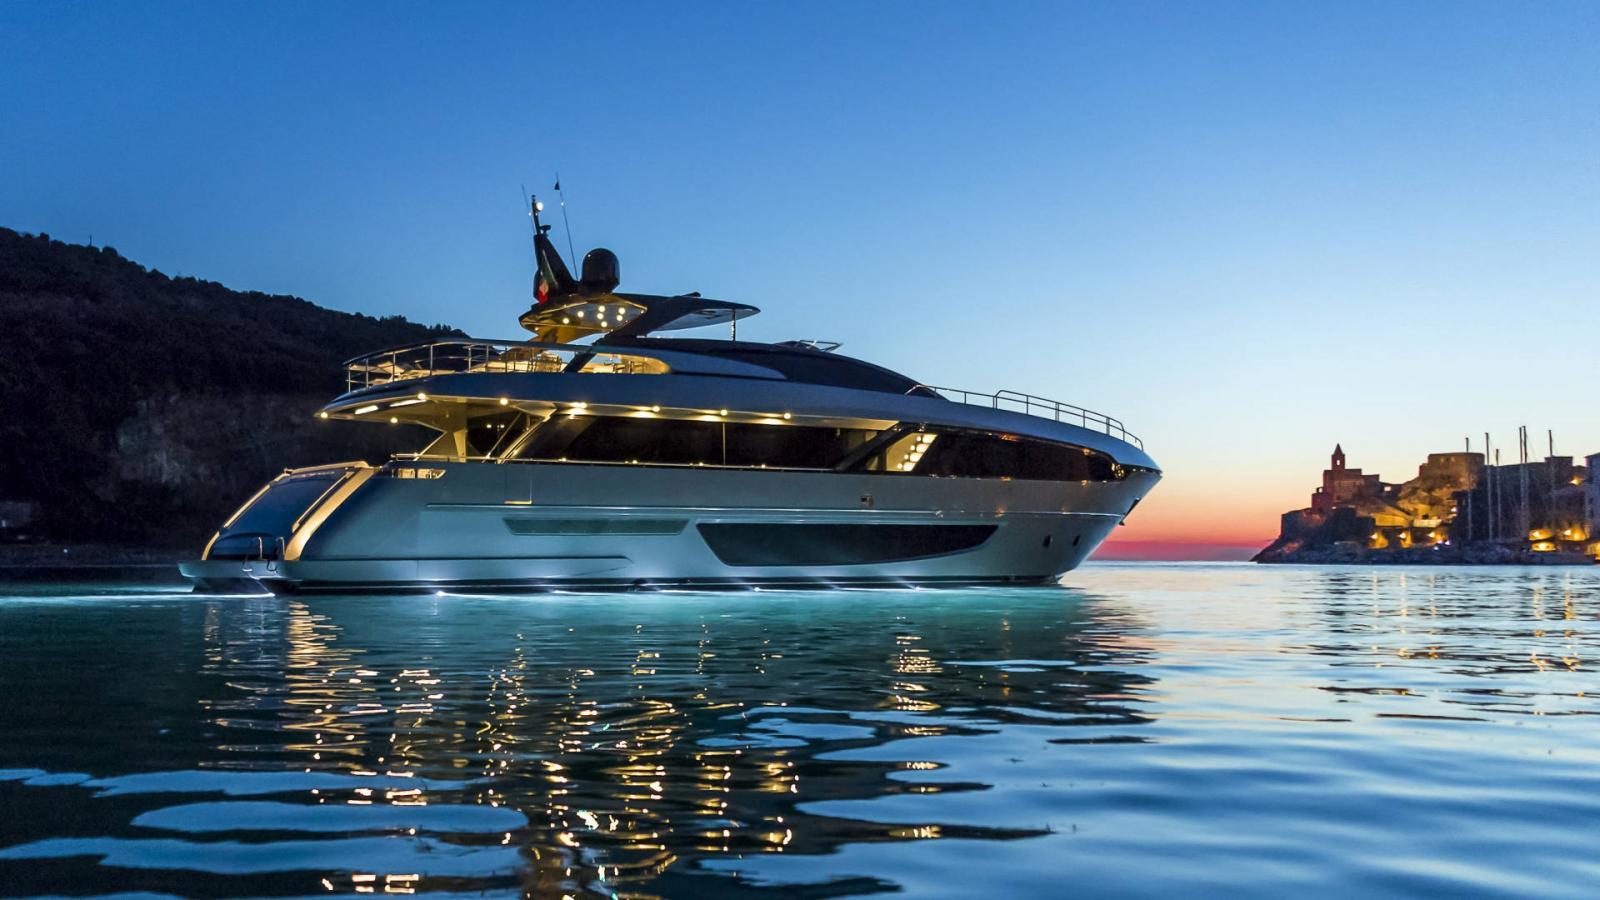 First Riva 100 Corsaro Yacht Delivered to Hong Kong